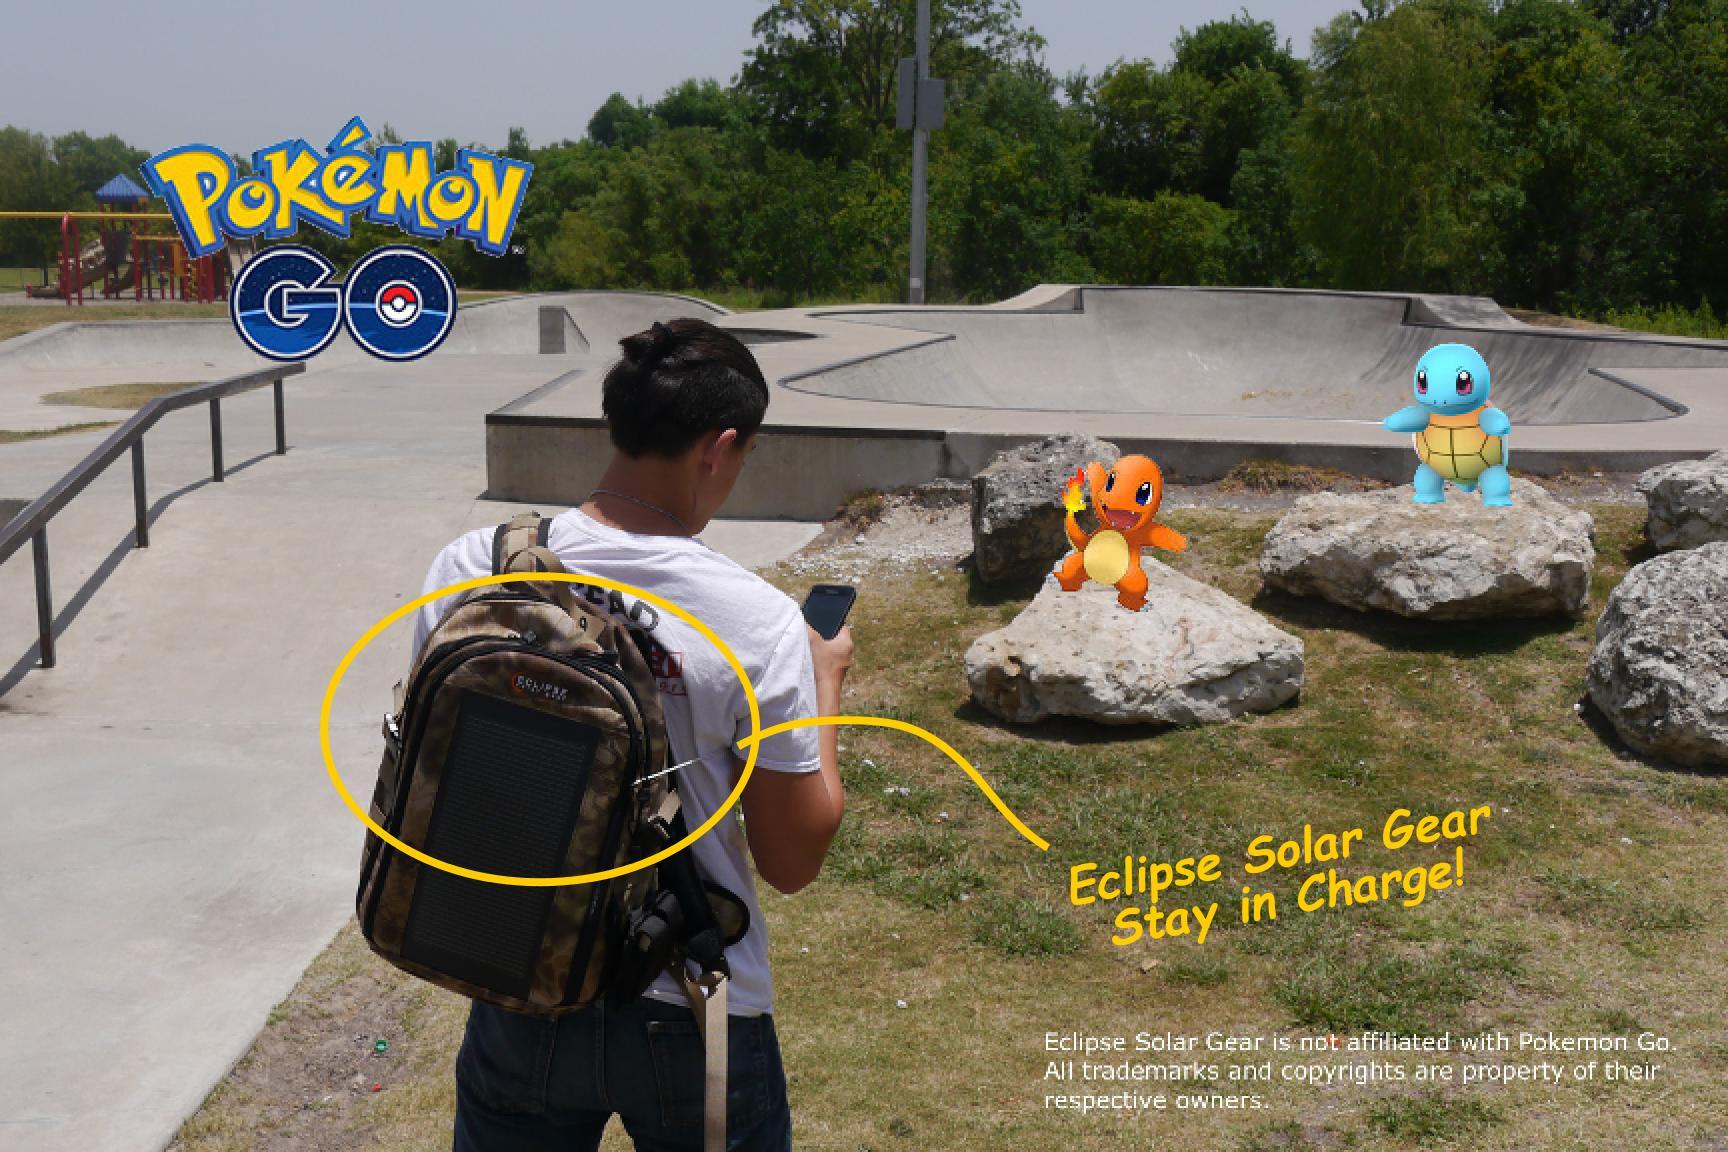 pokemon-eclipse-image-1a.jpg